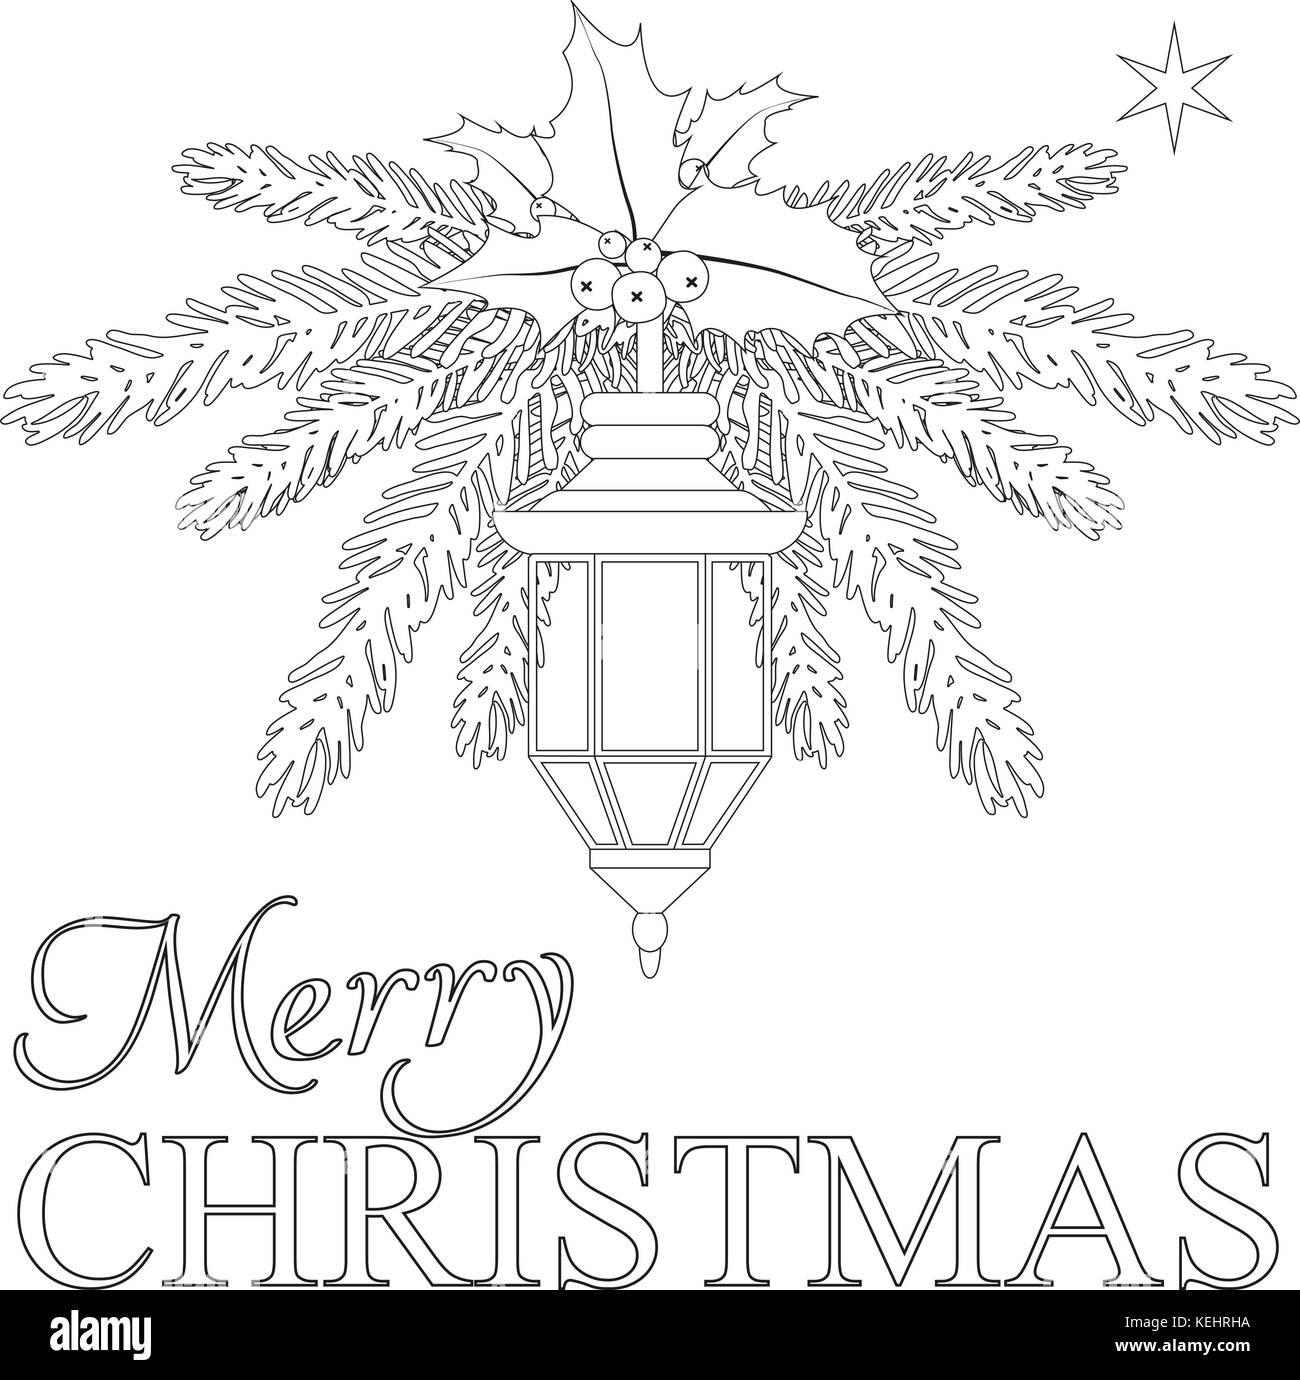 Merry Christmas Poster Con Lonely Star Street Lanterna E